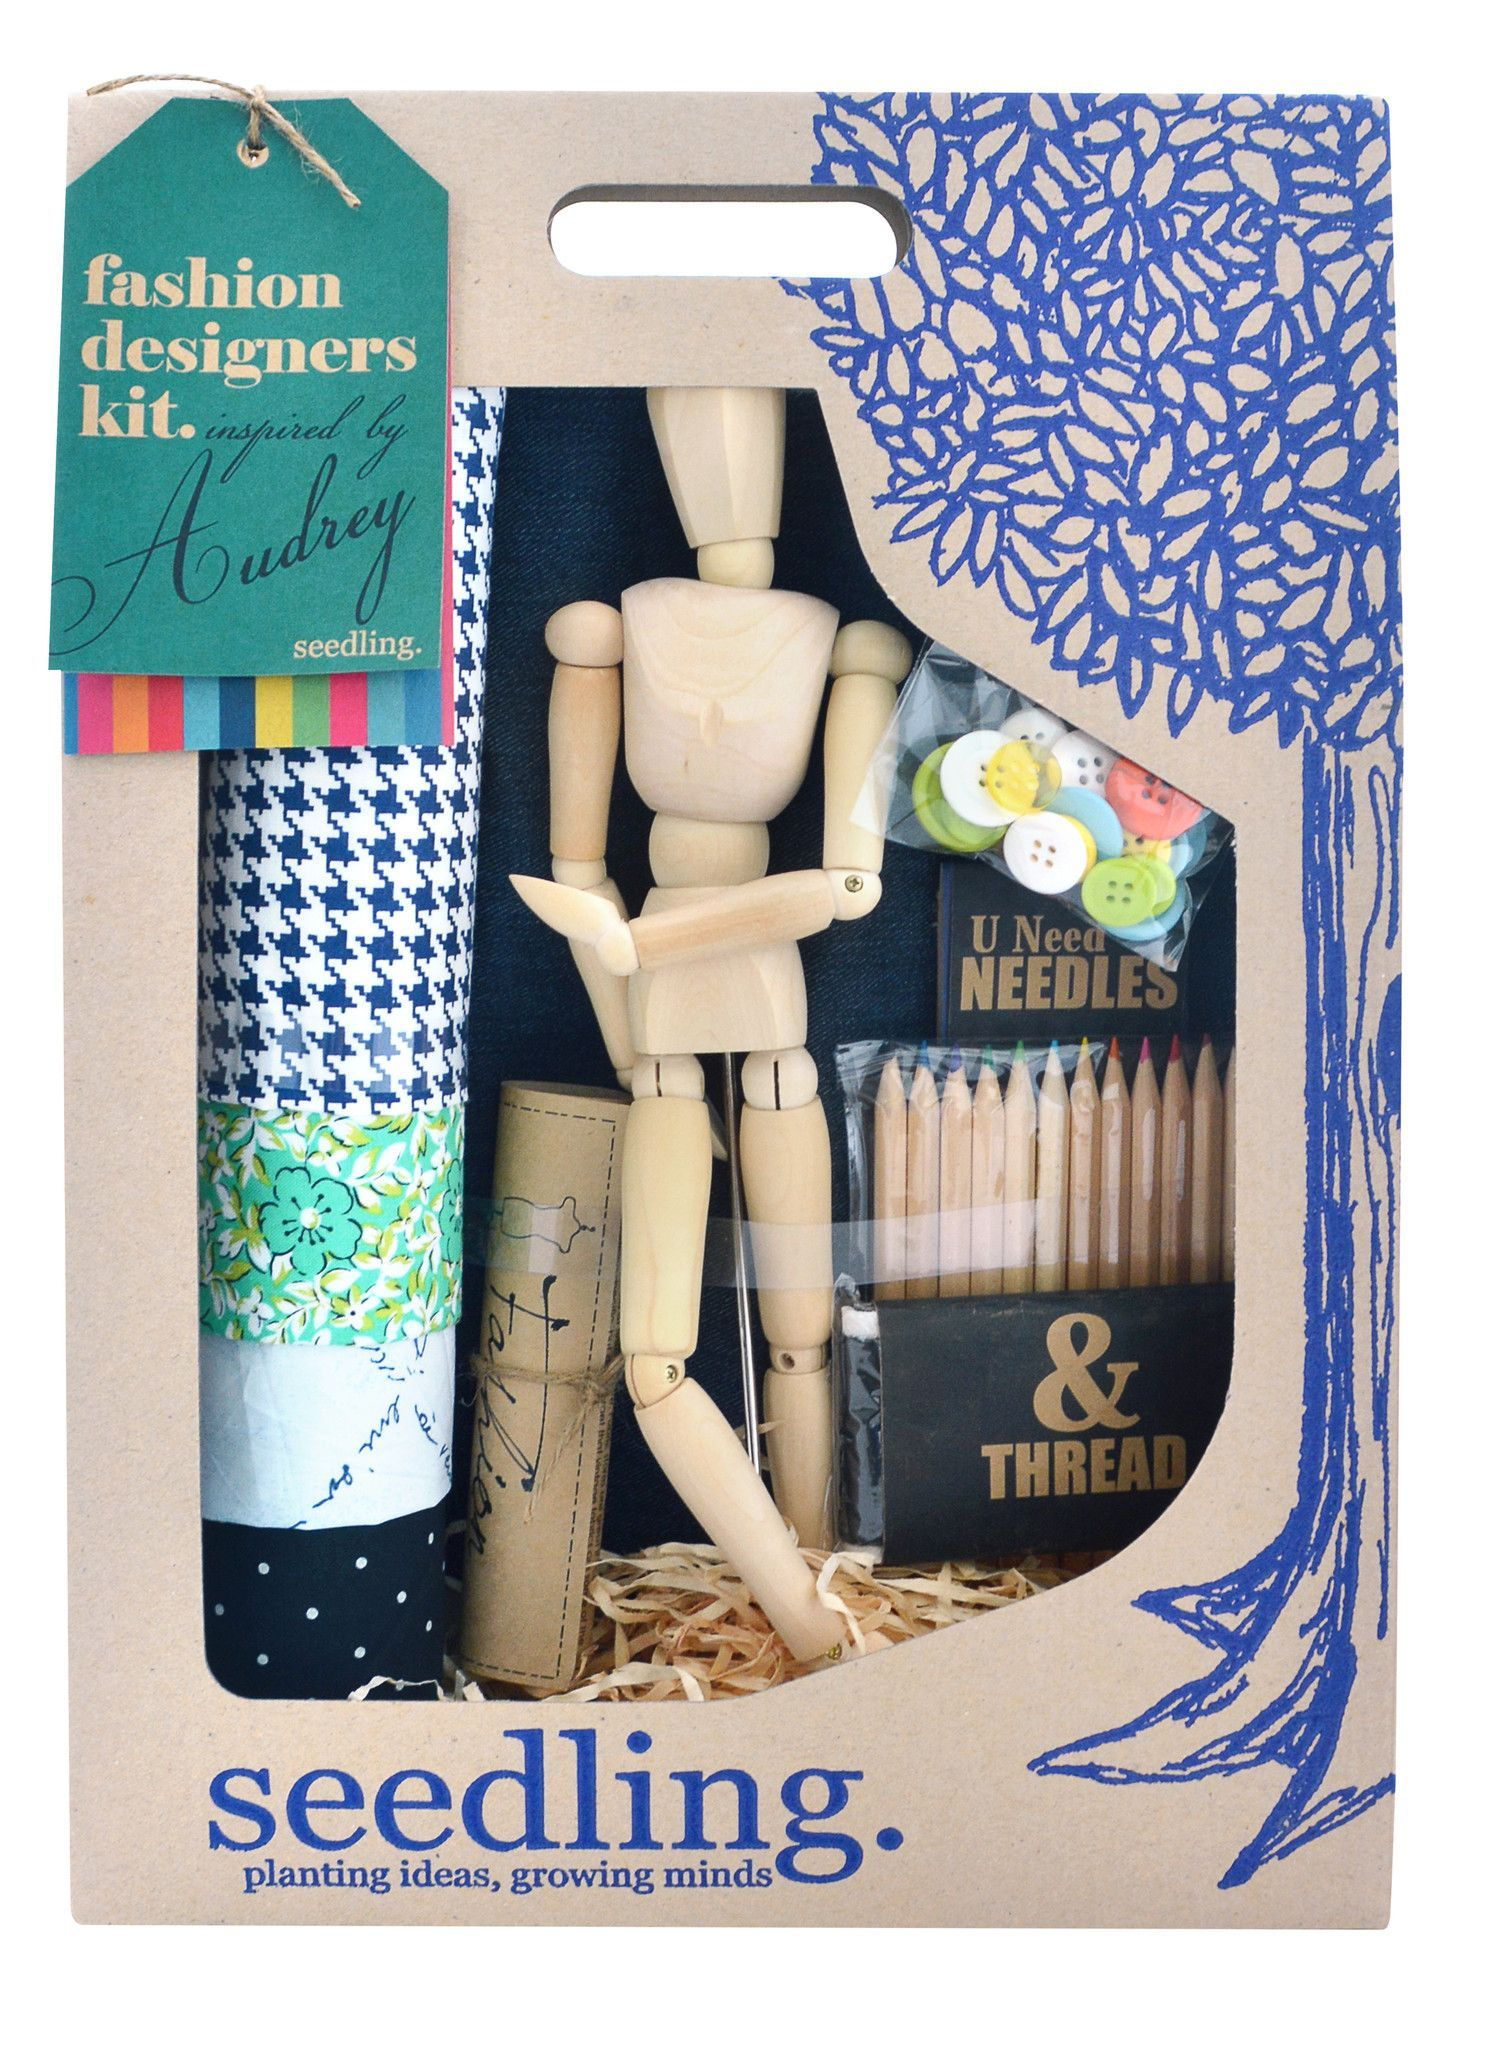 Fashion Designer Kit: Inspired by Audrey